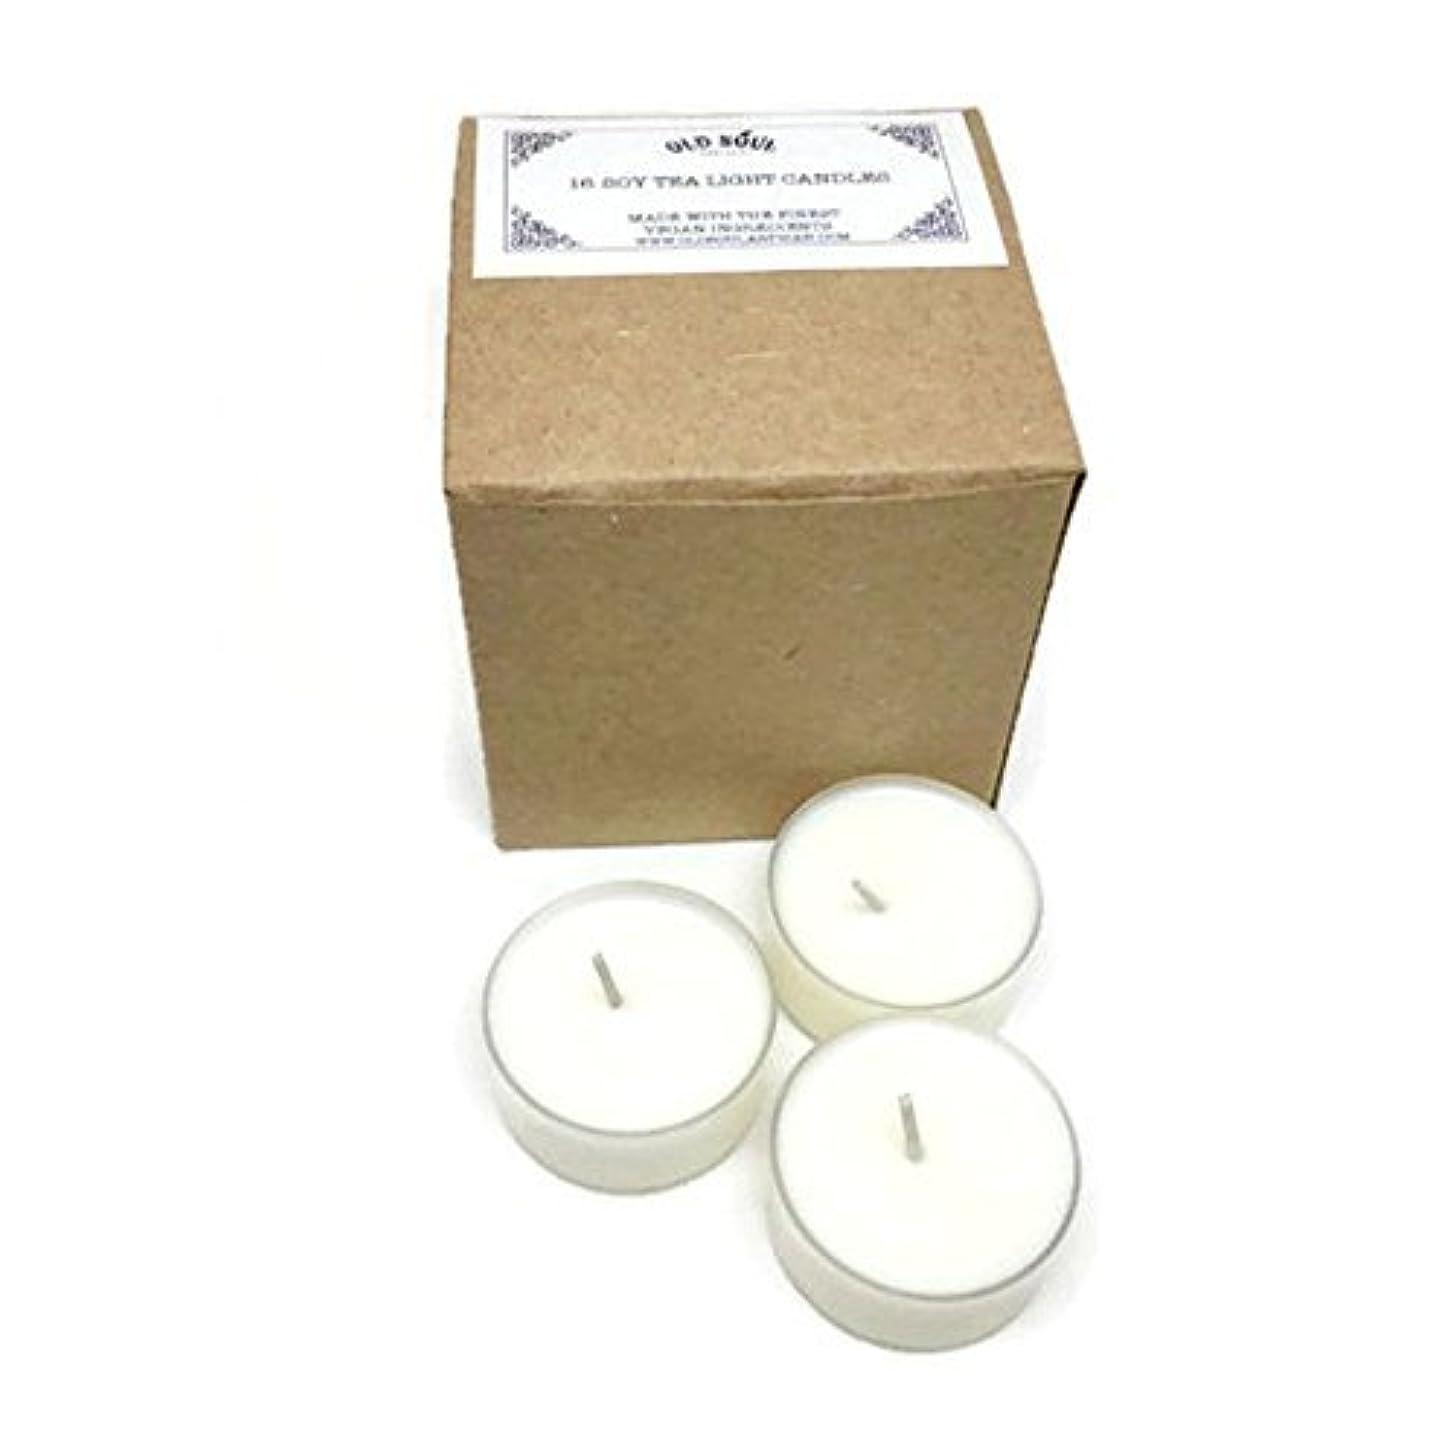 無実暴徒乳白色Vanilla Scented Vegan Soy Tea Light Candles - 16 Box Set [並行輸入品]